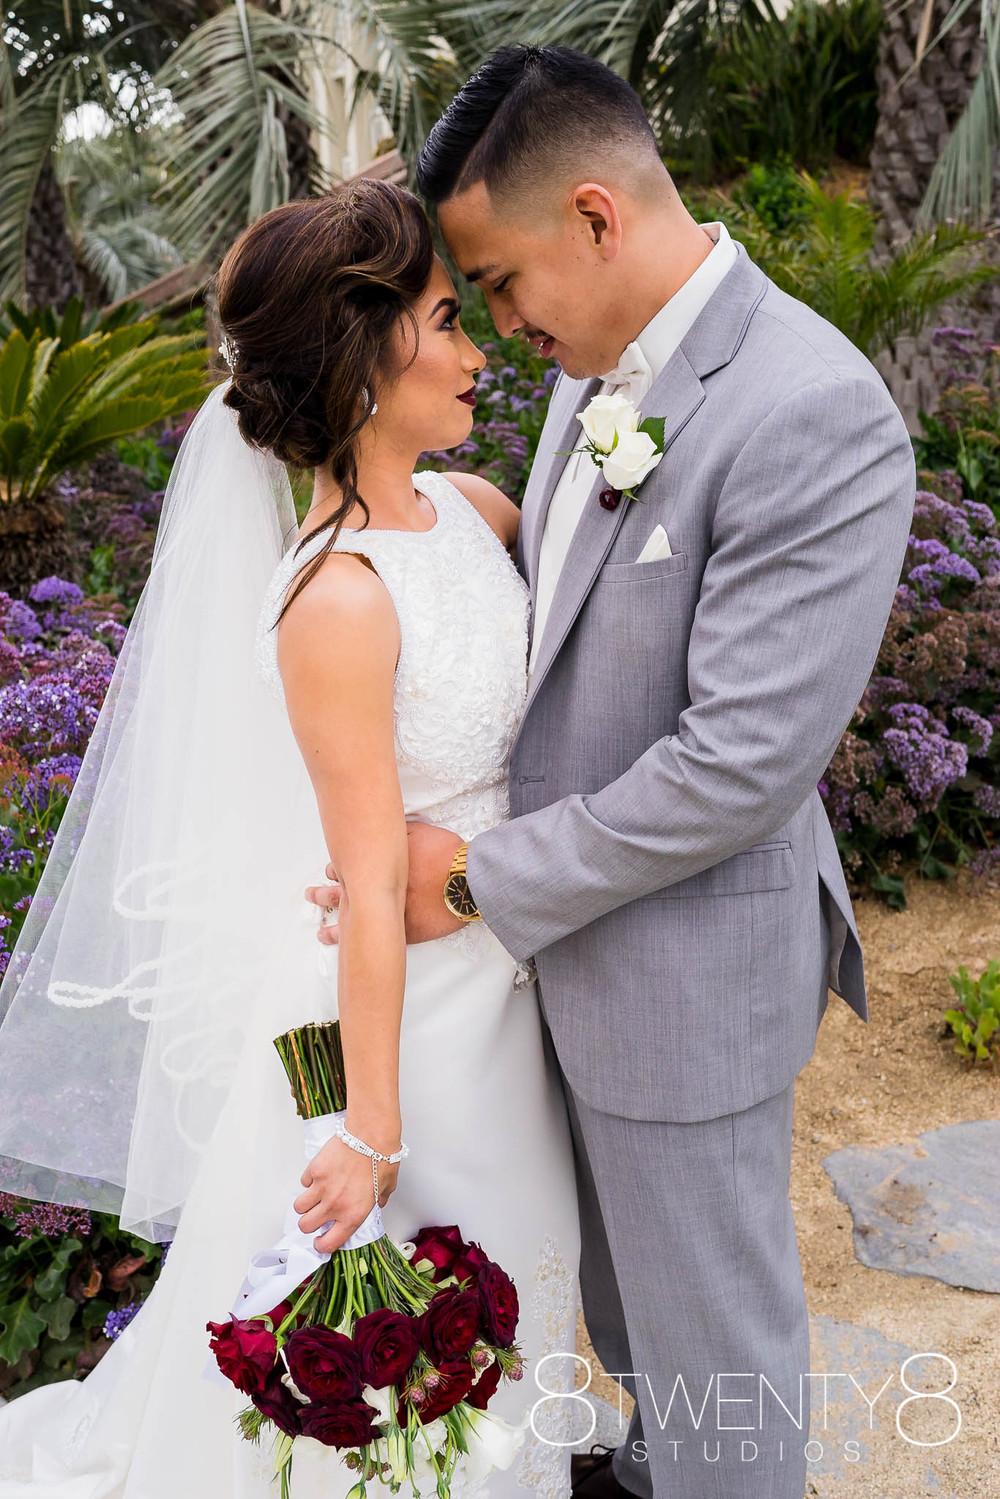 160409-ghelenn-josh-wedding-©8twenty8-Studios-0031.jpg